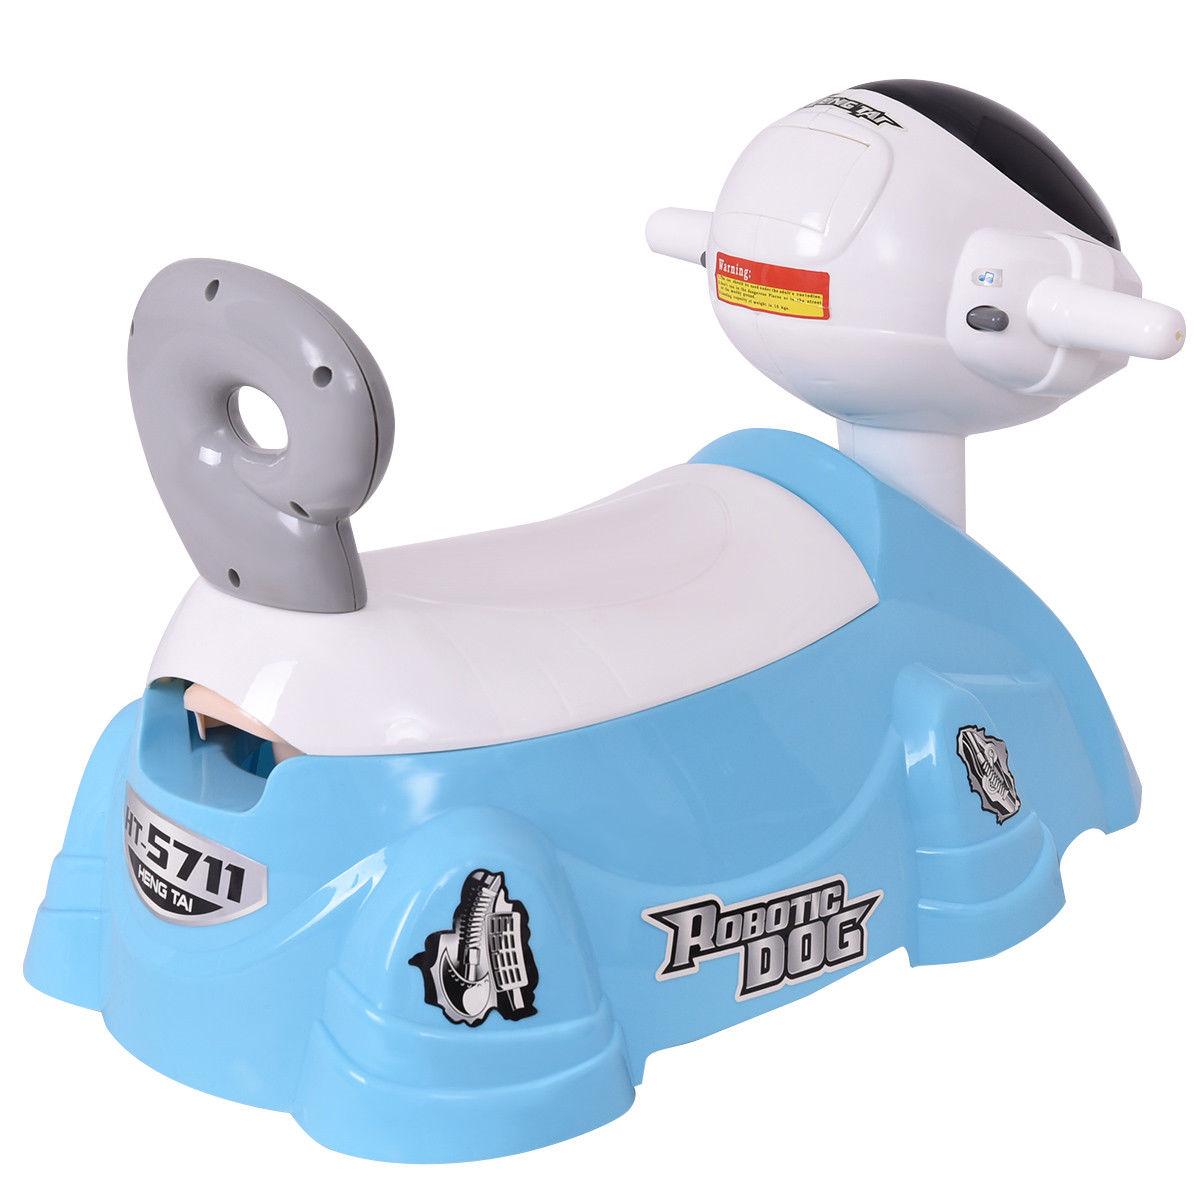 Dog Shaped Slide Baby Potty Training Toilet with Music